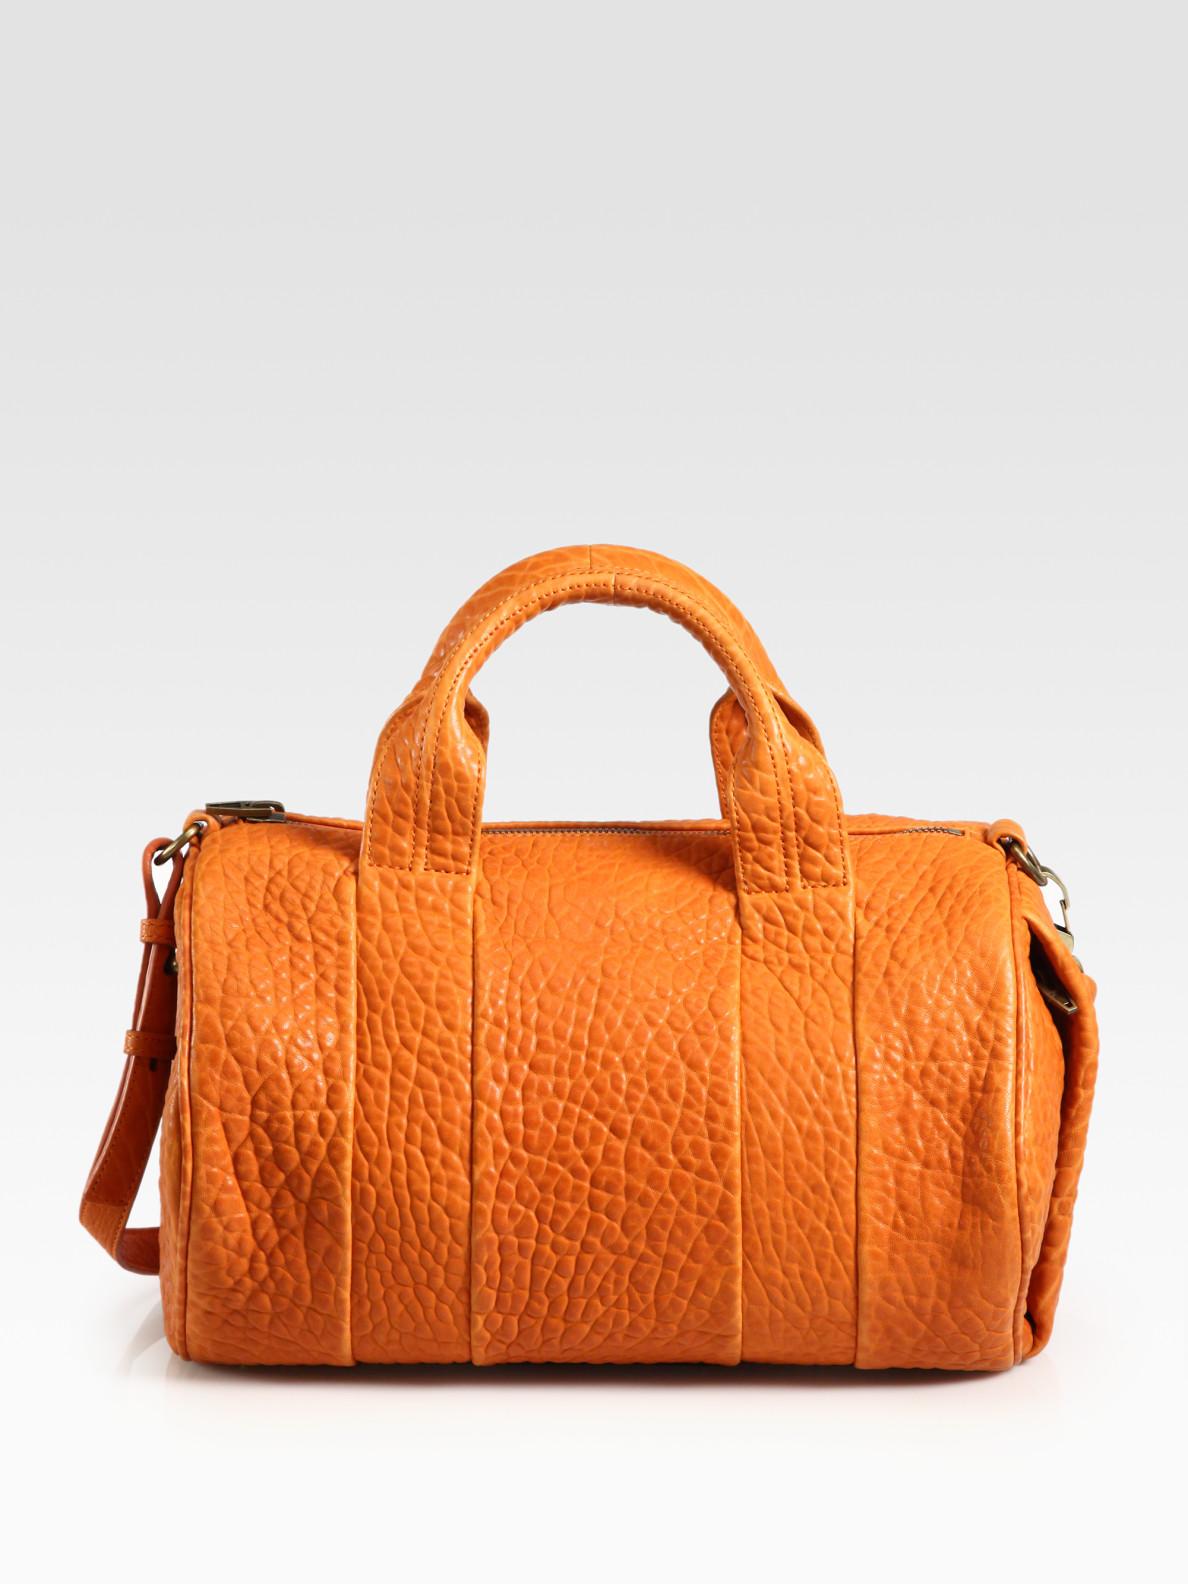 alexander wang rocco duffle bag in orange lyst. Black Bedroom Furniture Sets. Home Design Ideas